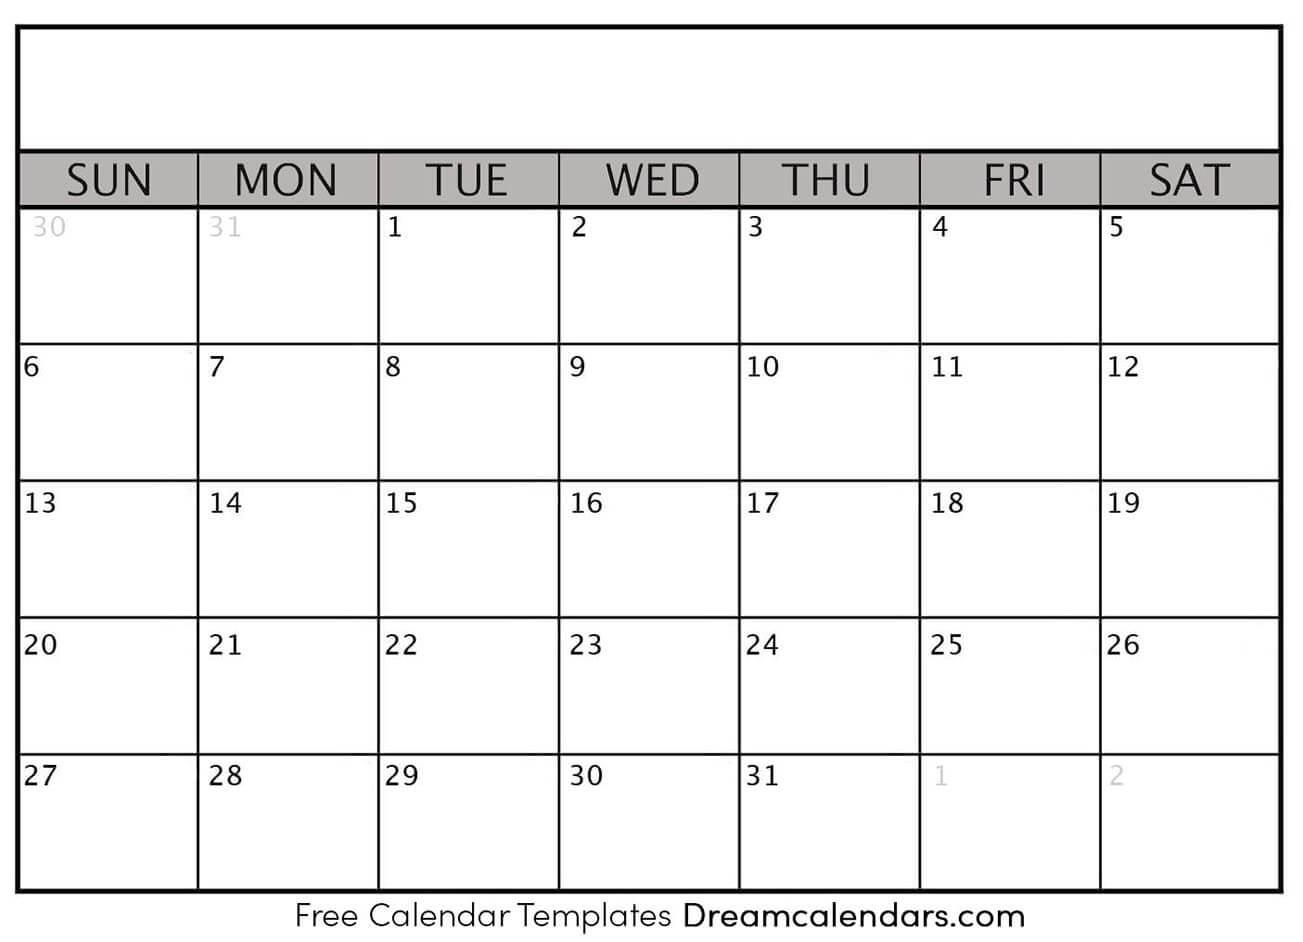 Dream Calendars - Make Your Calendar Template Blog